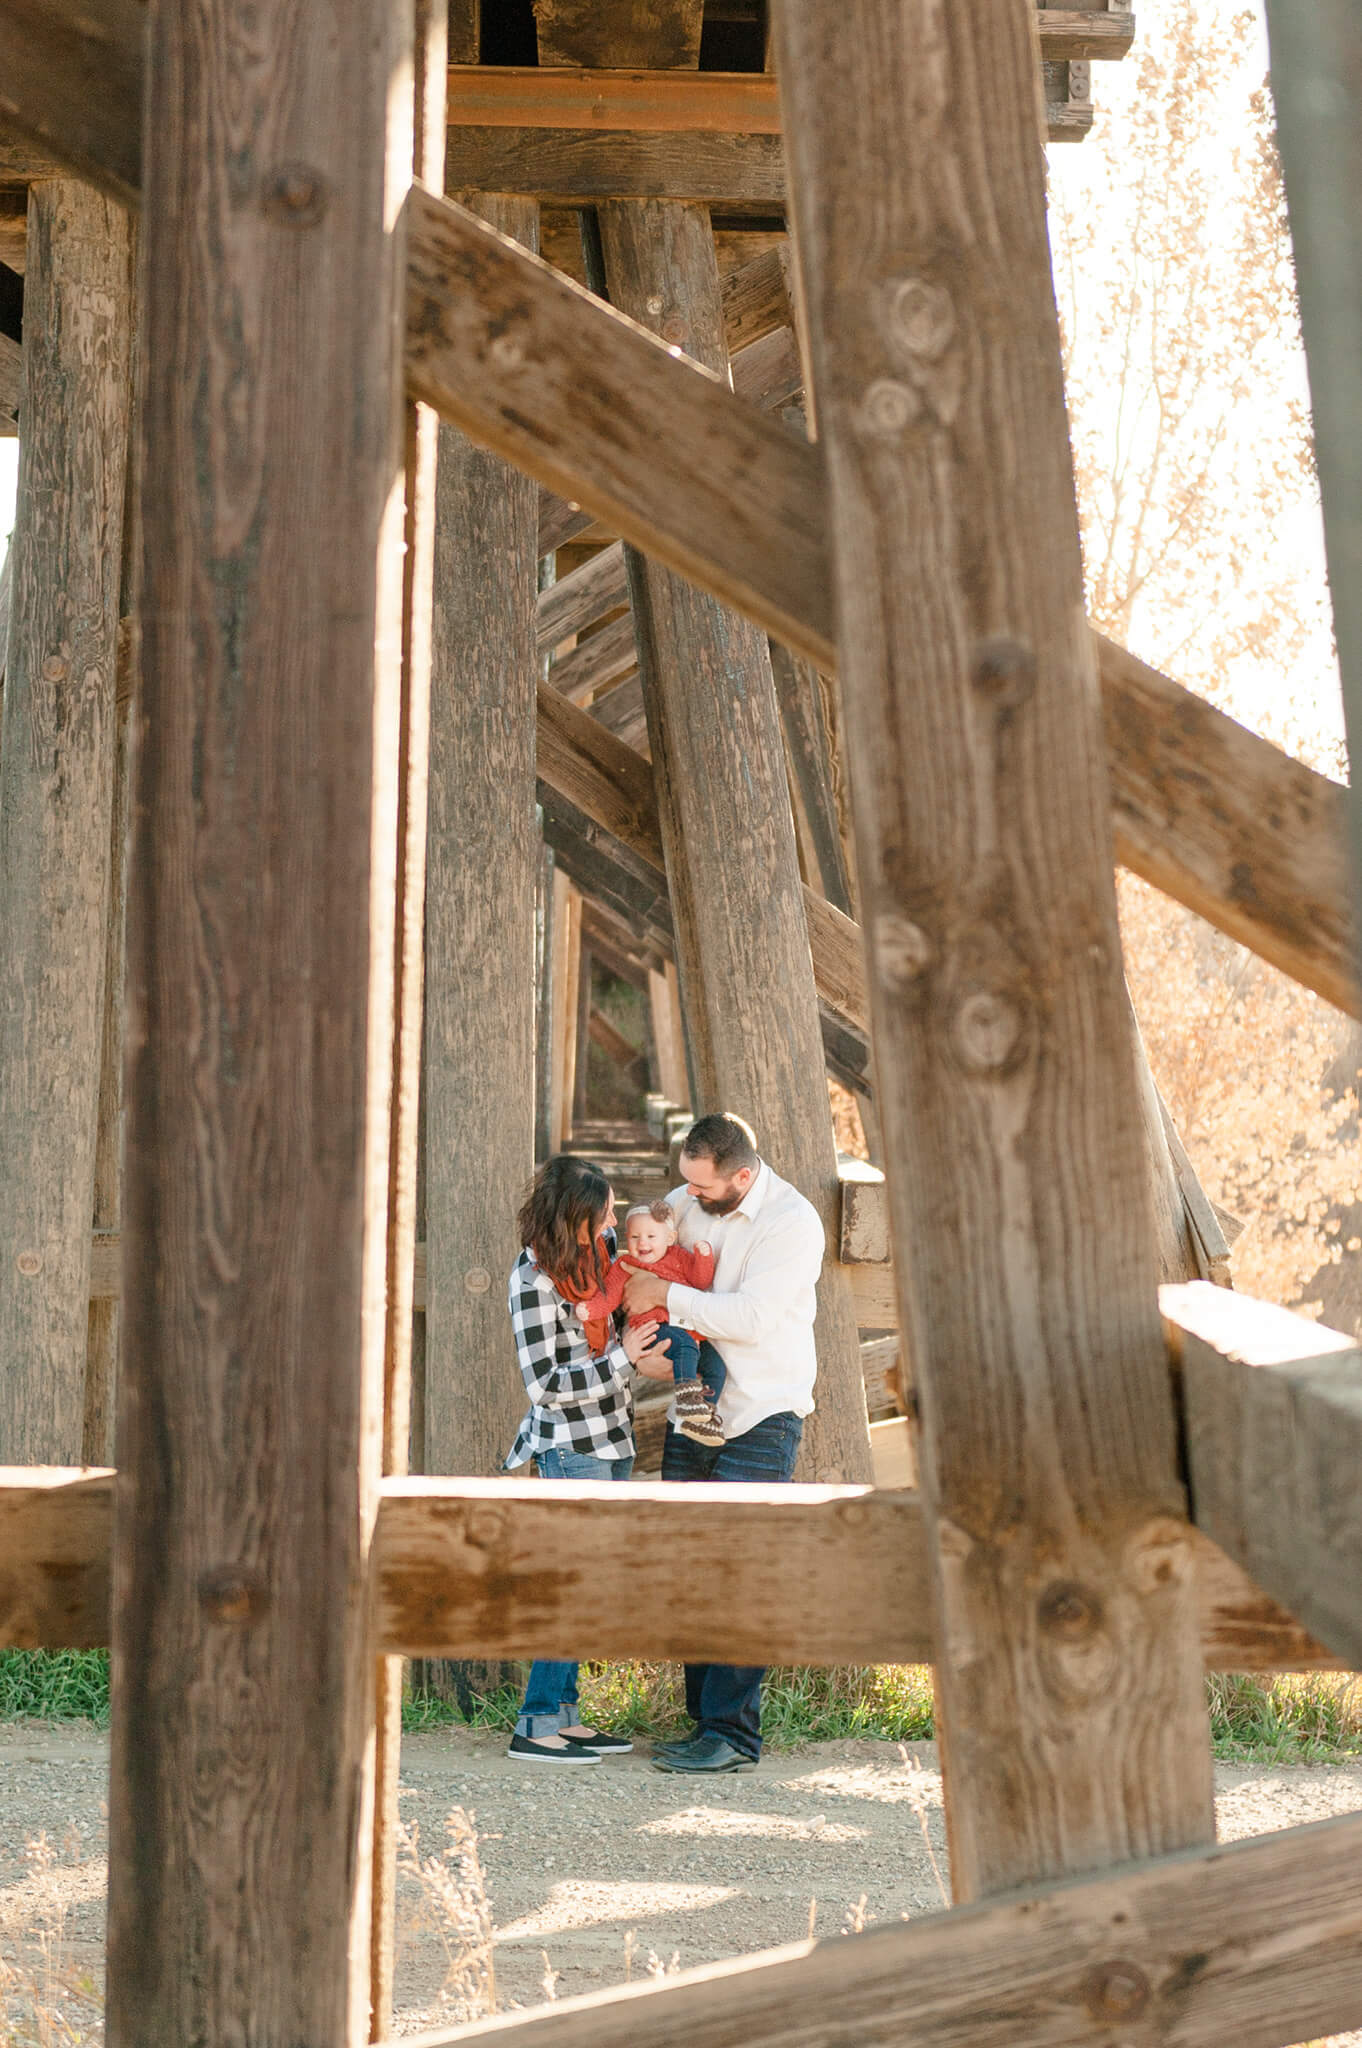 Korchinski family under wooden bridge near White City Saskatchewan